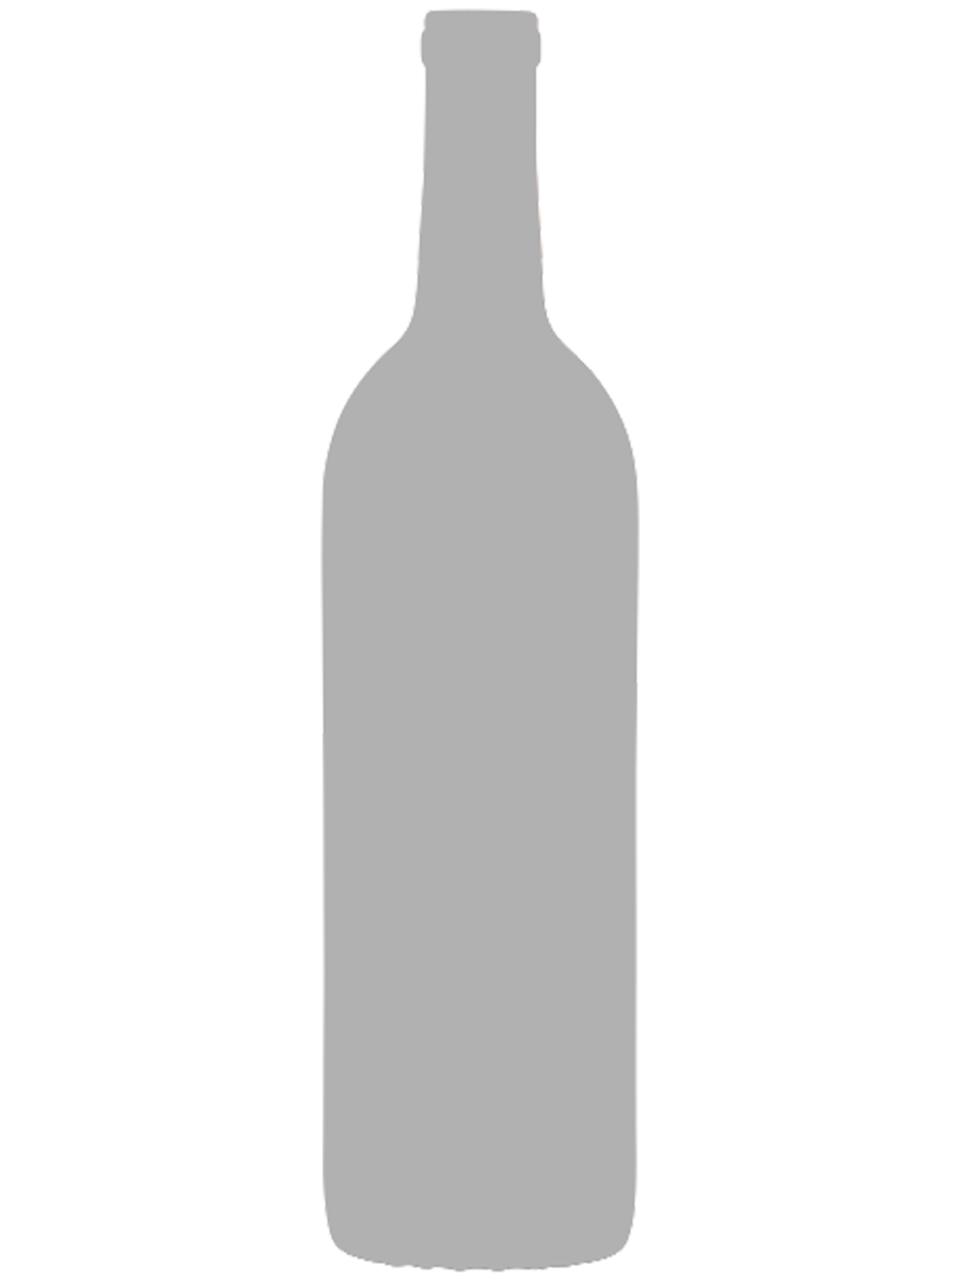 Chateau Cantenac-Brown Margaux 3eme Cru 2013